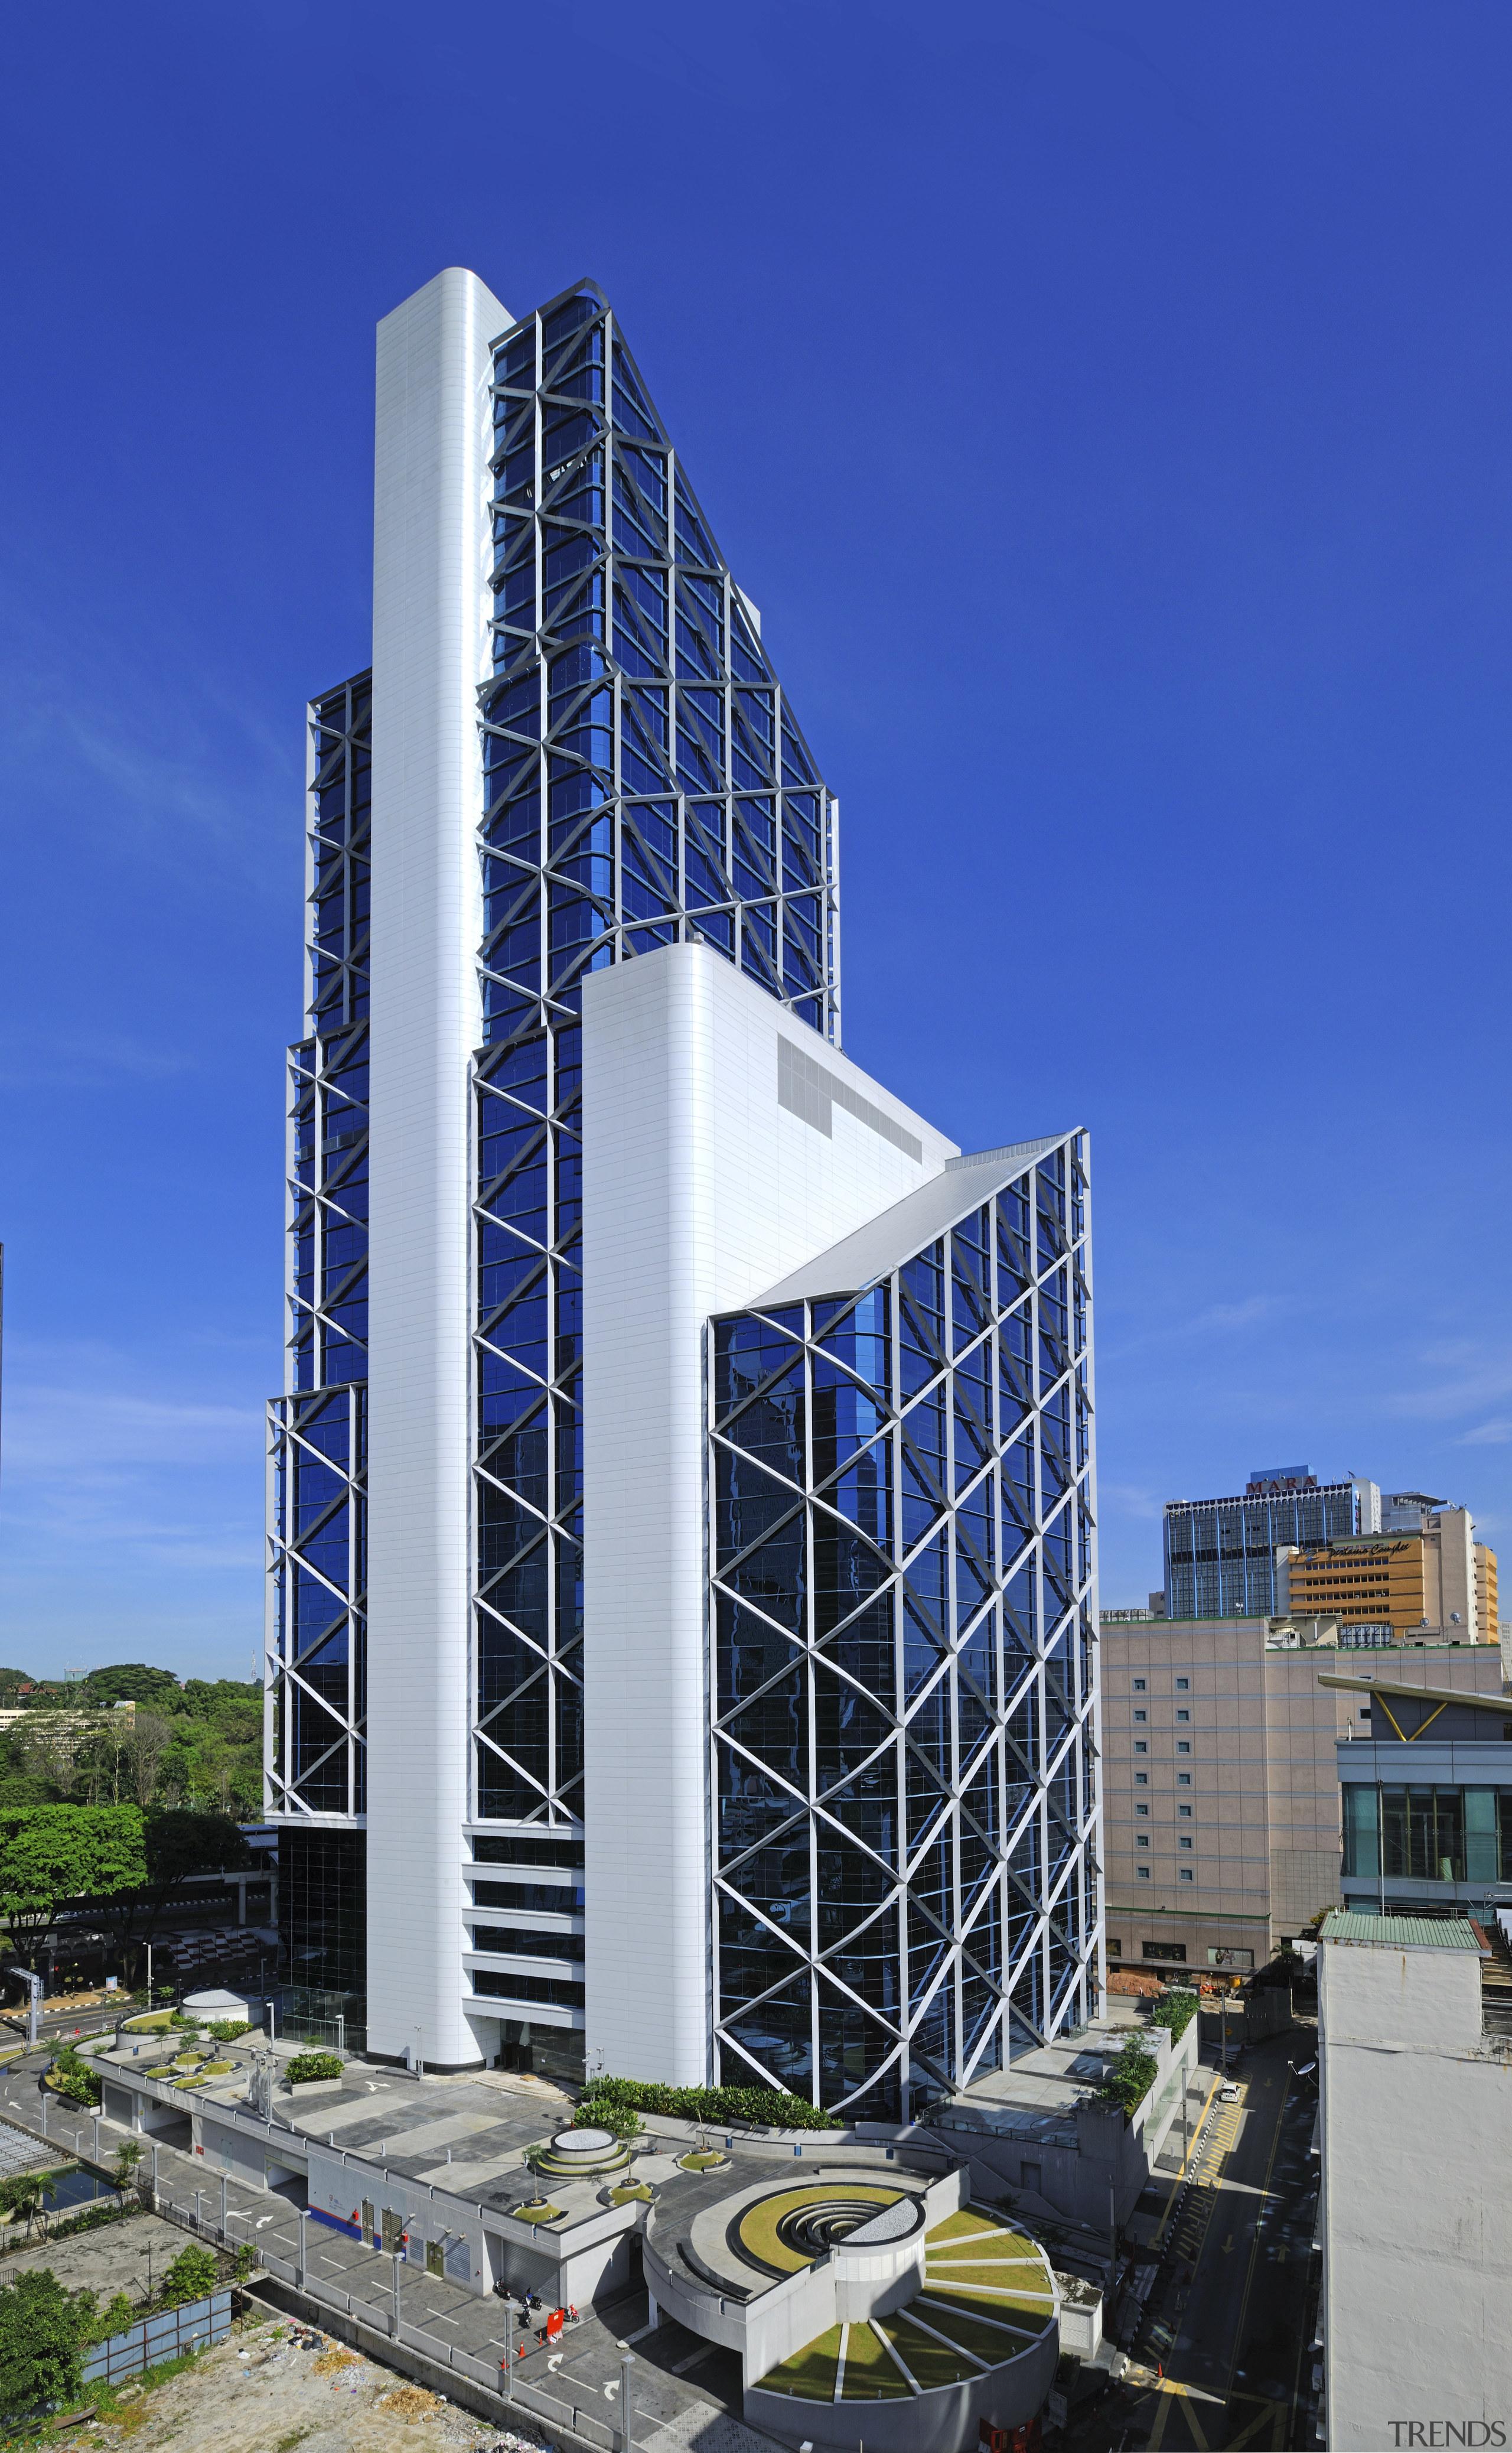 The new Menara Bumiputra Commerce tower is appropriate architecture, building, commercial building, condominium, corporate headquarters, daytime, facade, headquarters, metropolitan area, mixed use, sky, skyscraper, tower block, blue